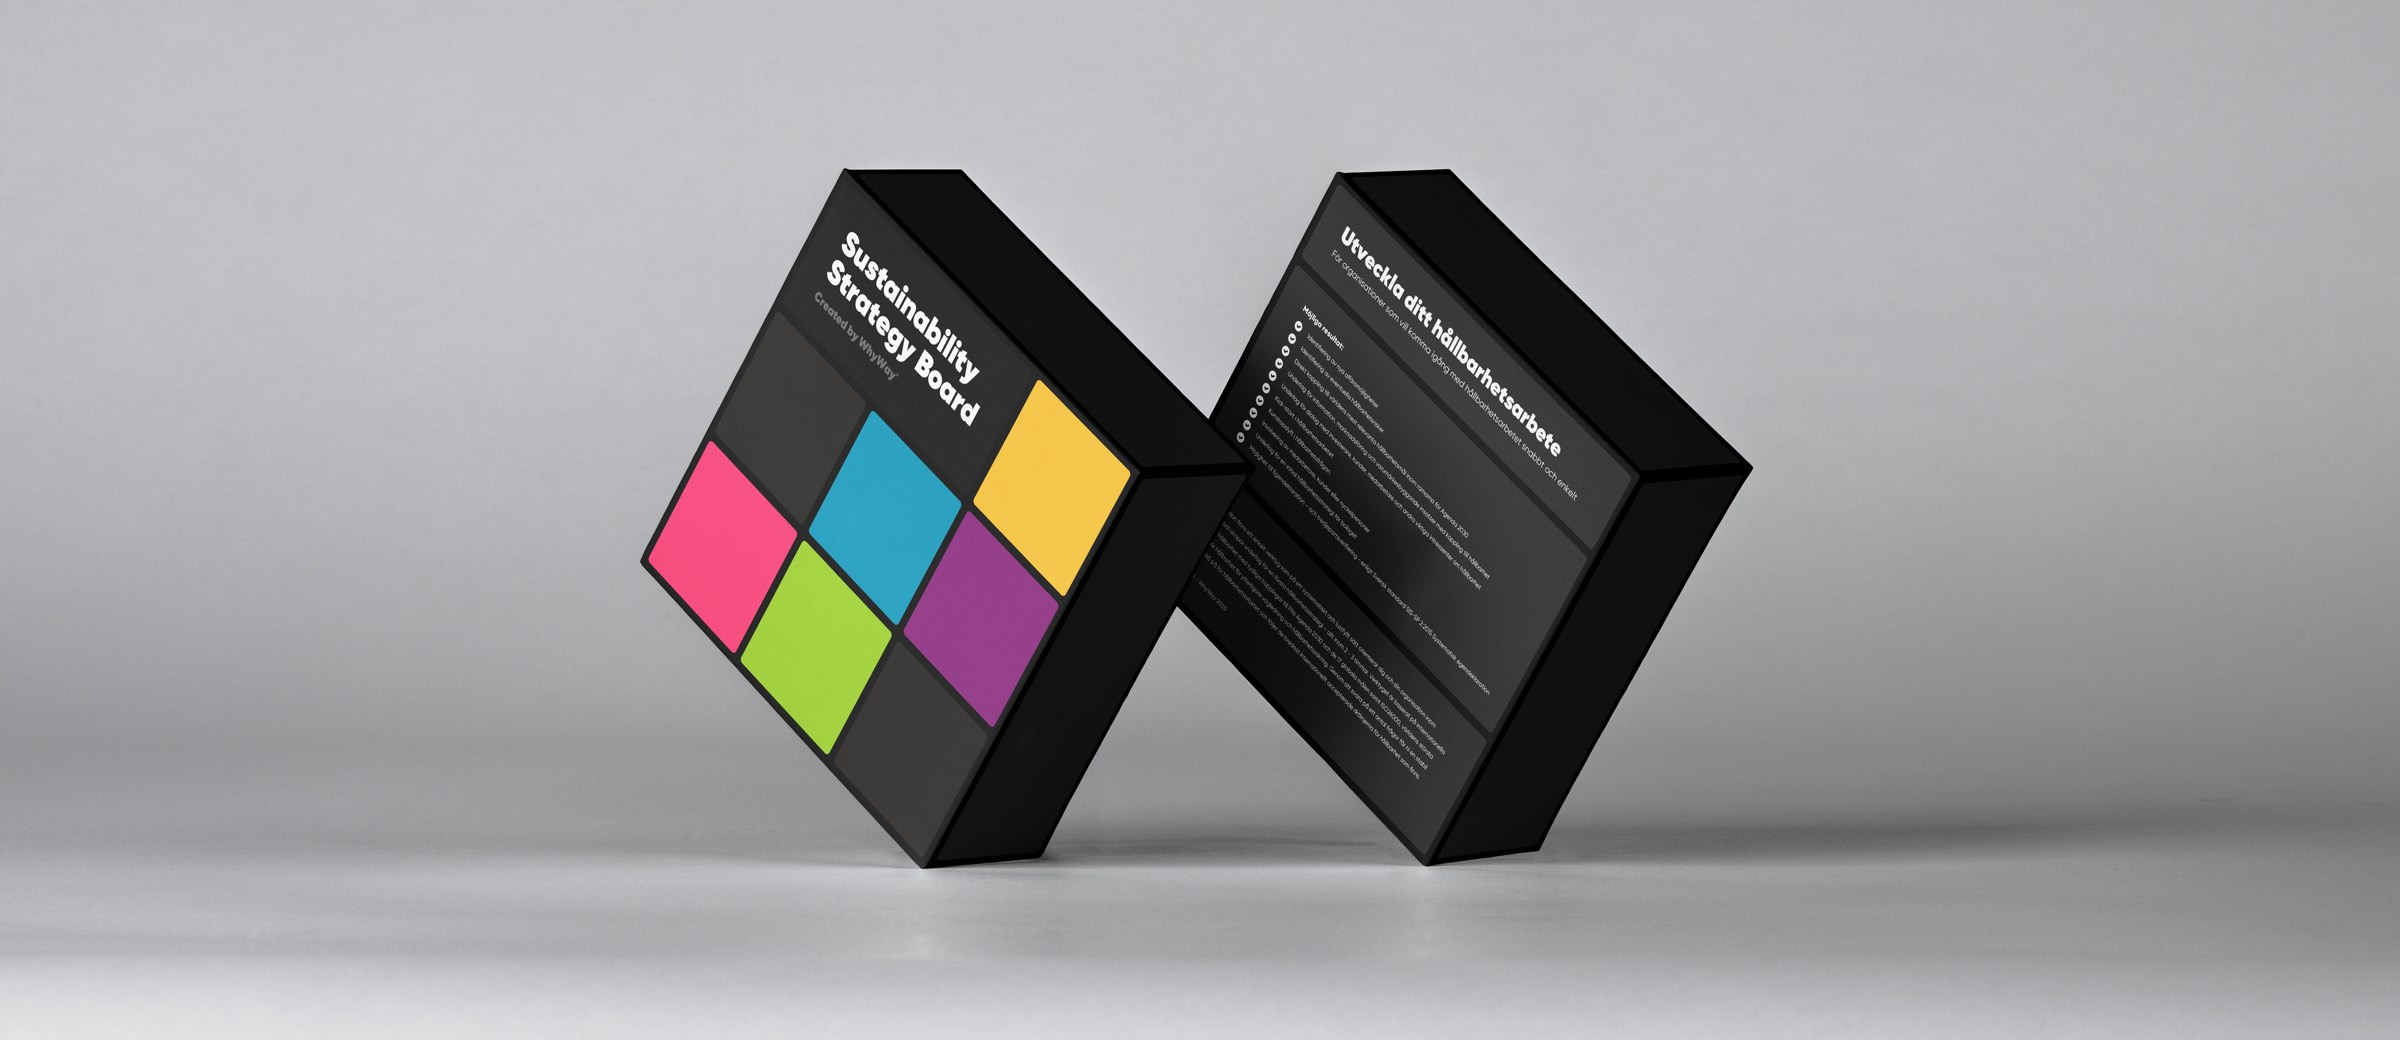 Sustainability Strategy Board Box Mockup